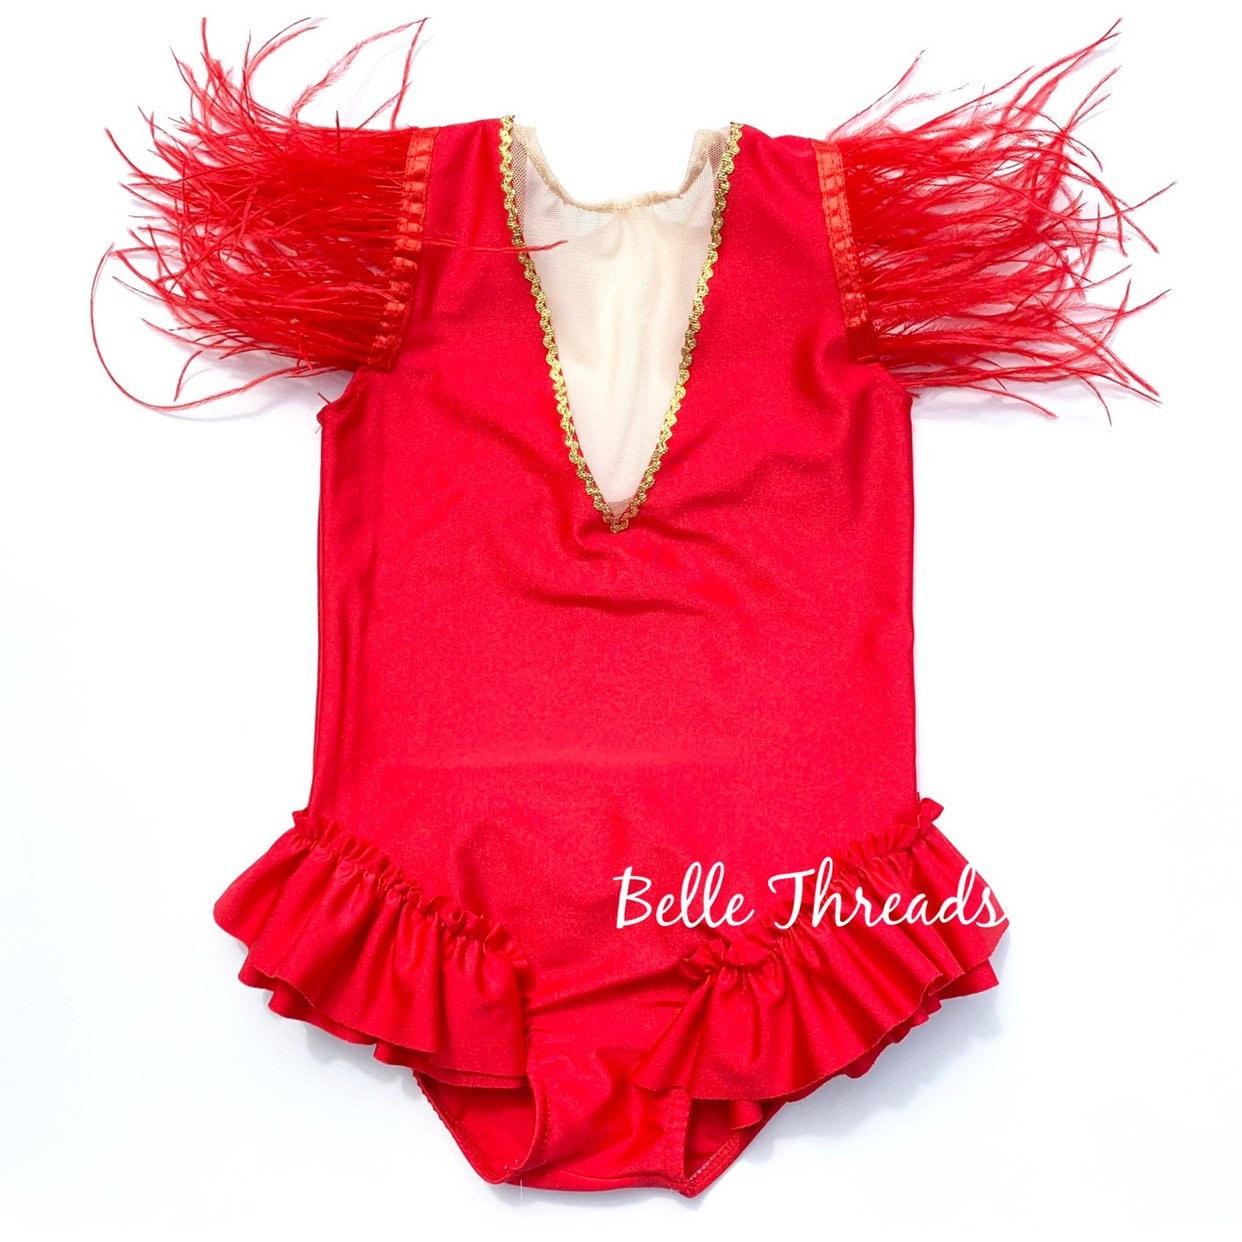 Women/'s Trapeze Artist Cosplay Costume Short Cape Top High Cut Leotard Bodysuit